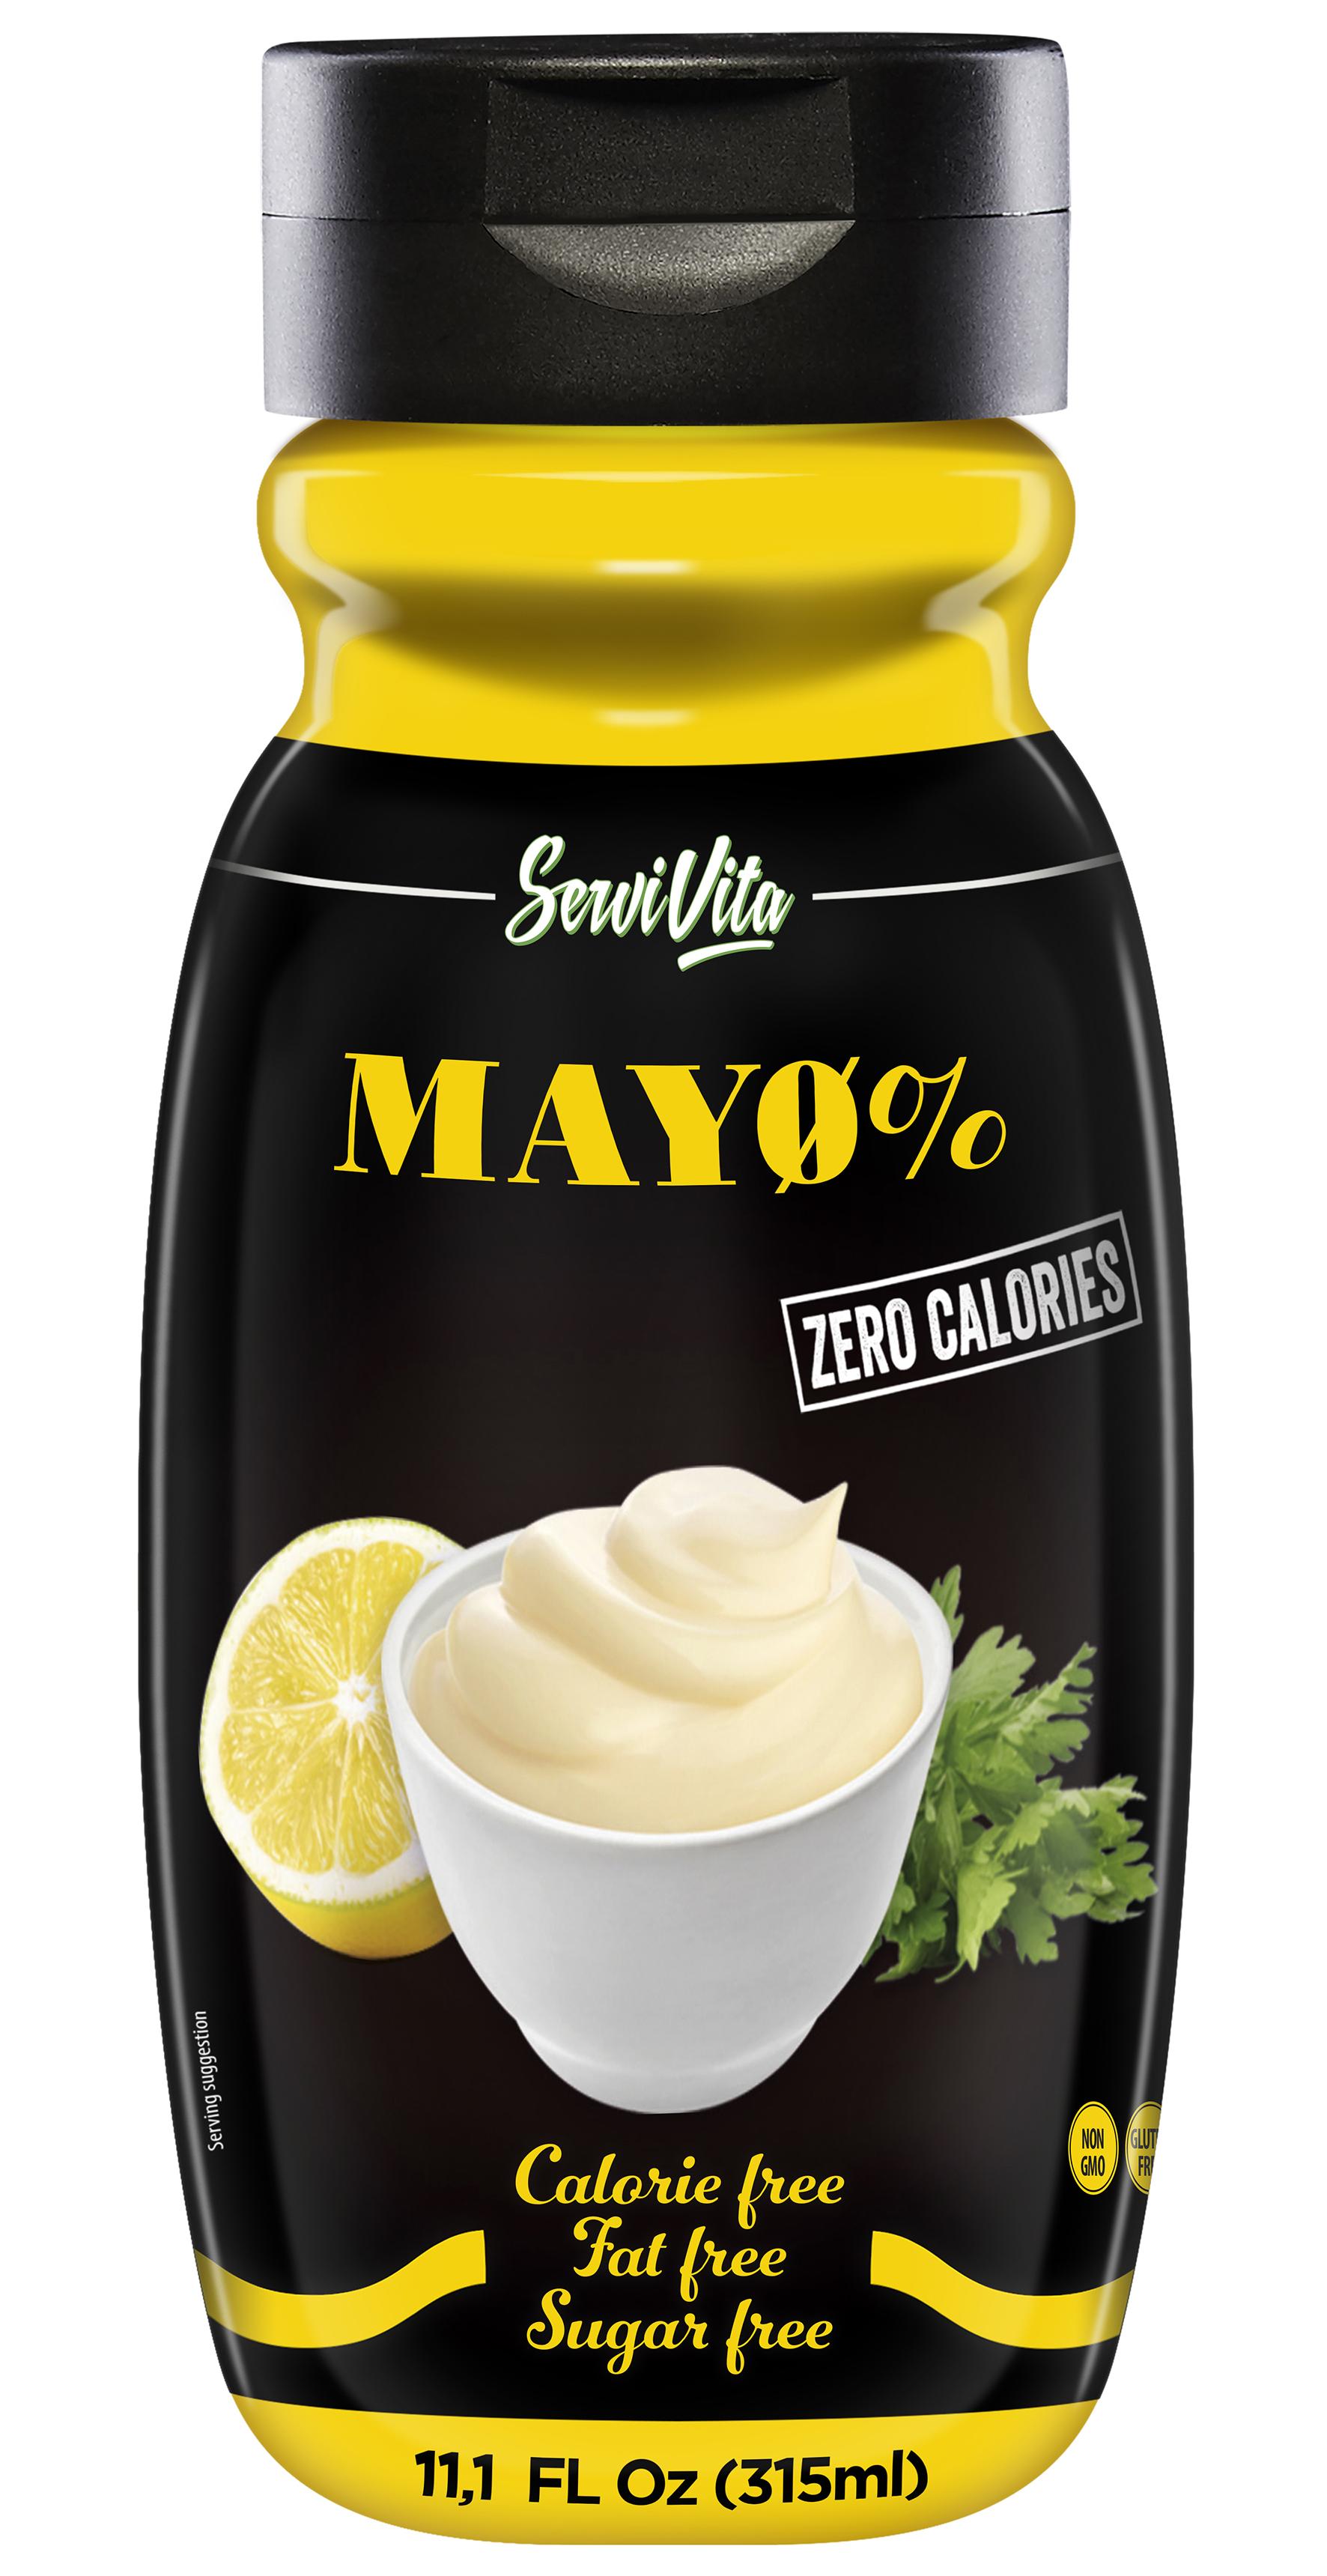 Mayonesa 0 calorías Servivita